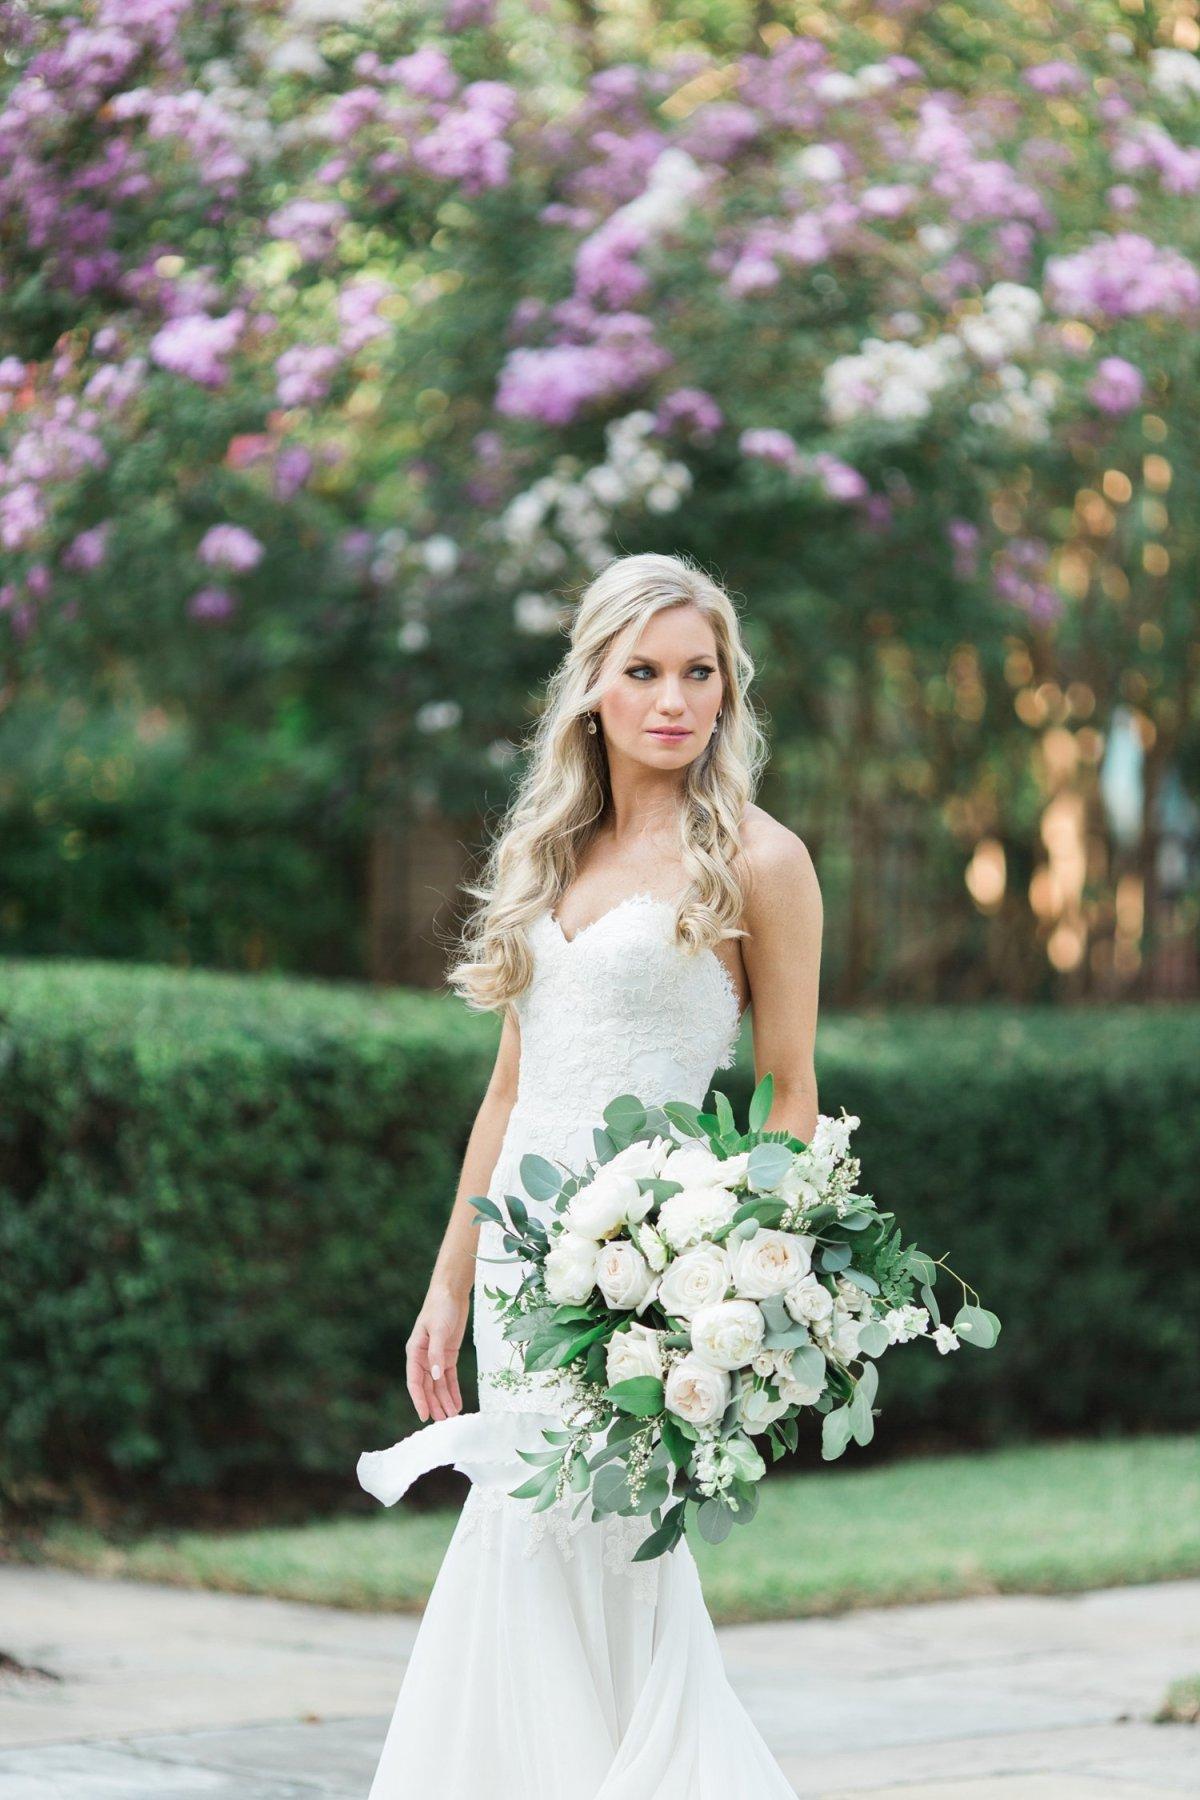 dallas-bridal-wedding-portrait-photographer-aldredge-house-emily-5.jpg